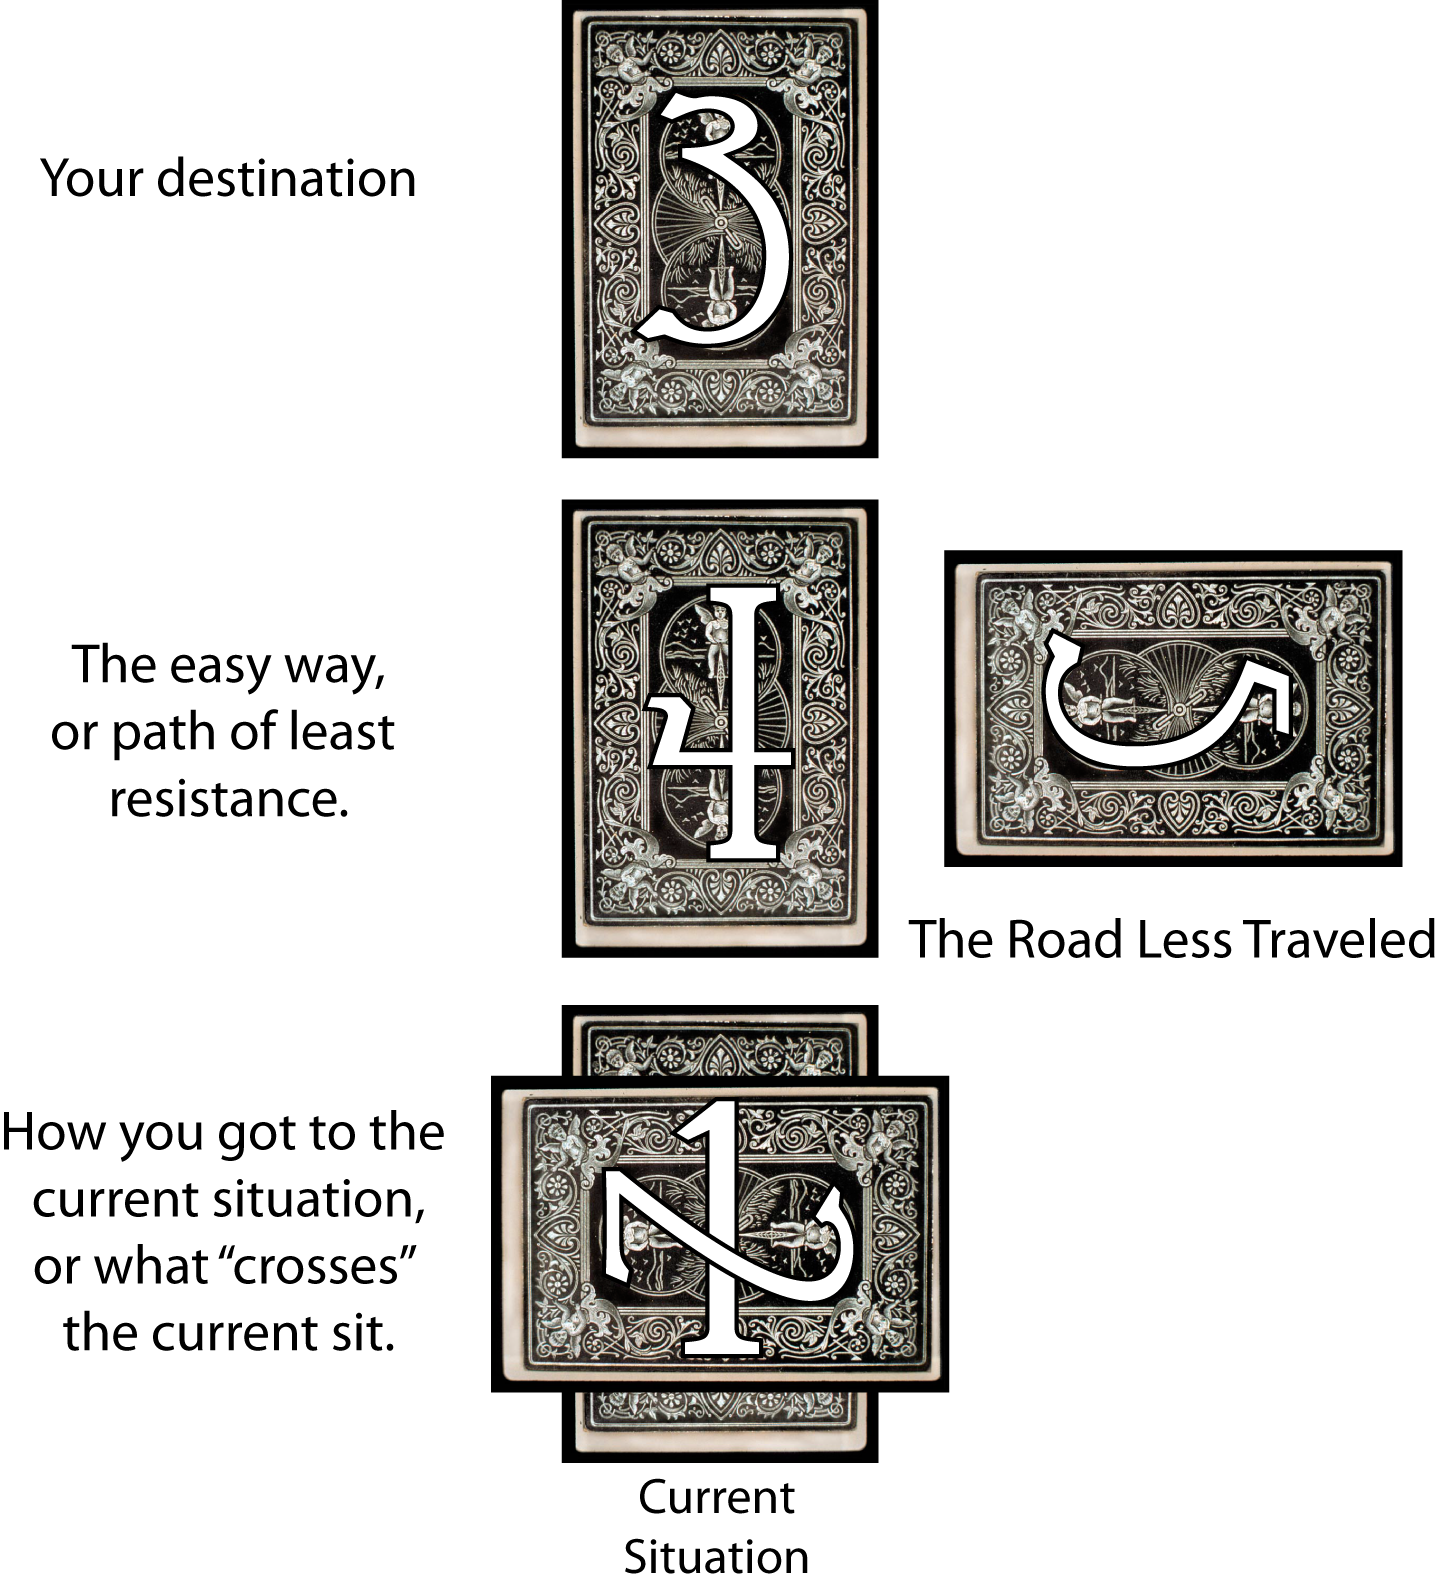 5 Card Tarot Spread